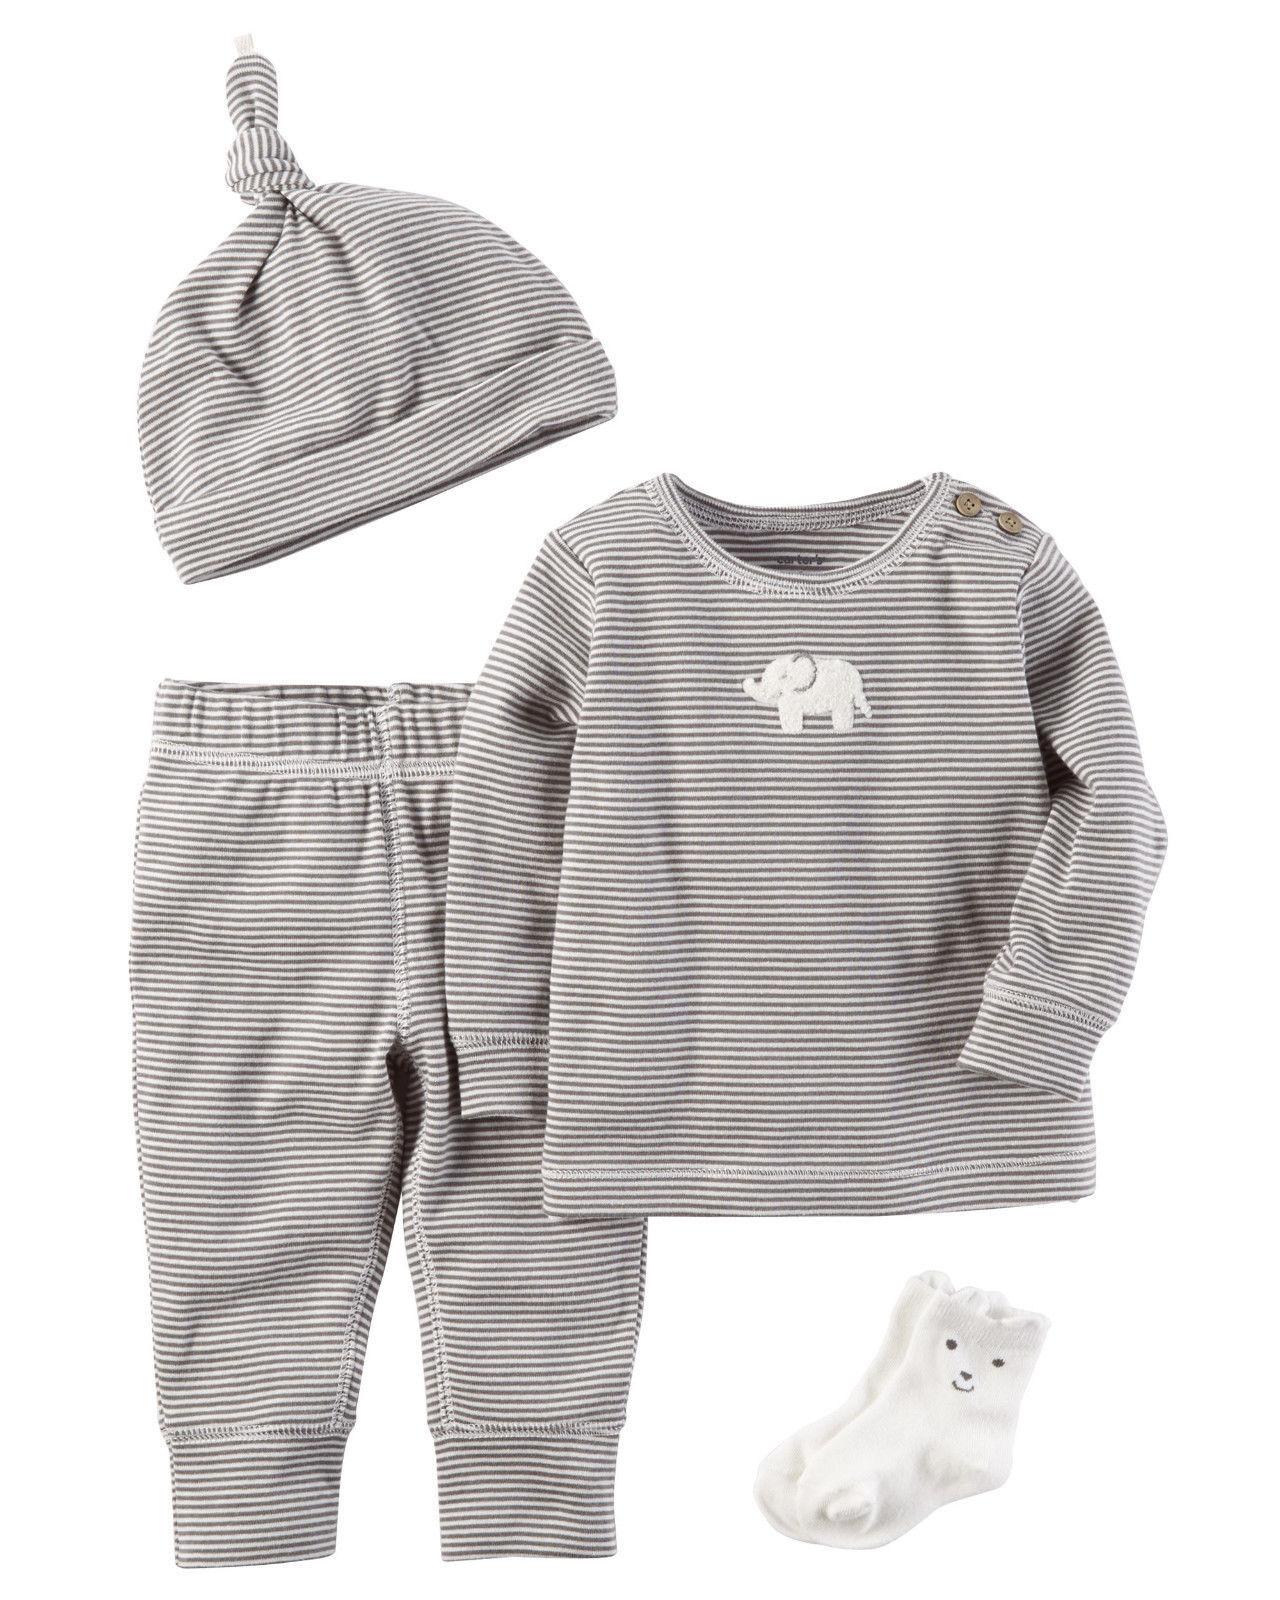 12-24 Months Gray Blue Newborn Hat 6-12 Set of 2 Gymboree Baby Boy Infant 0-6